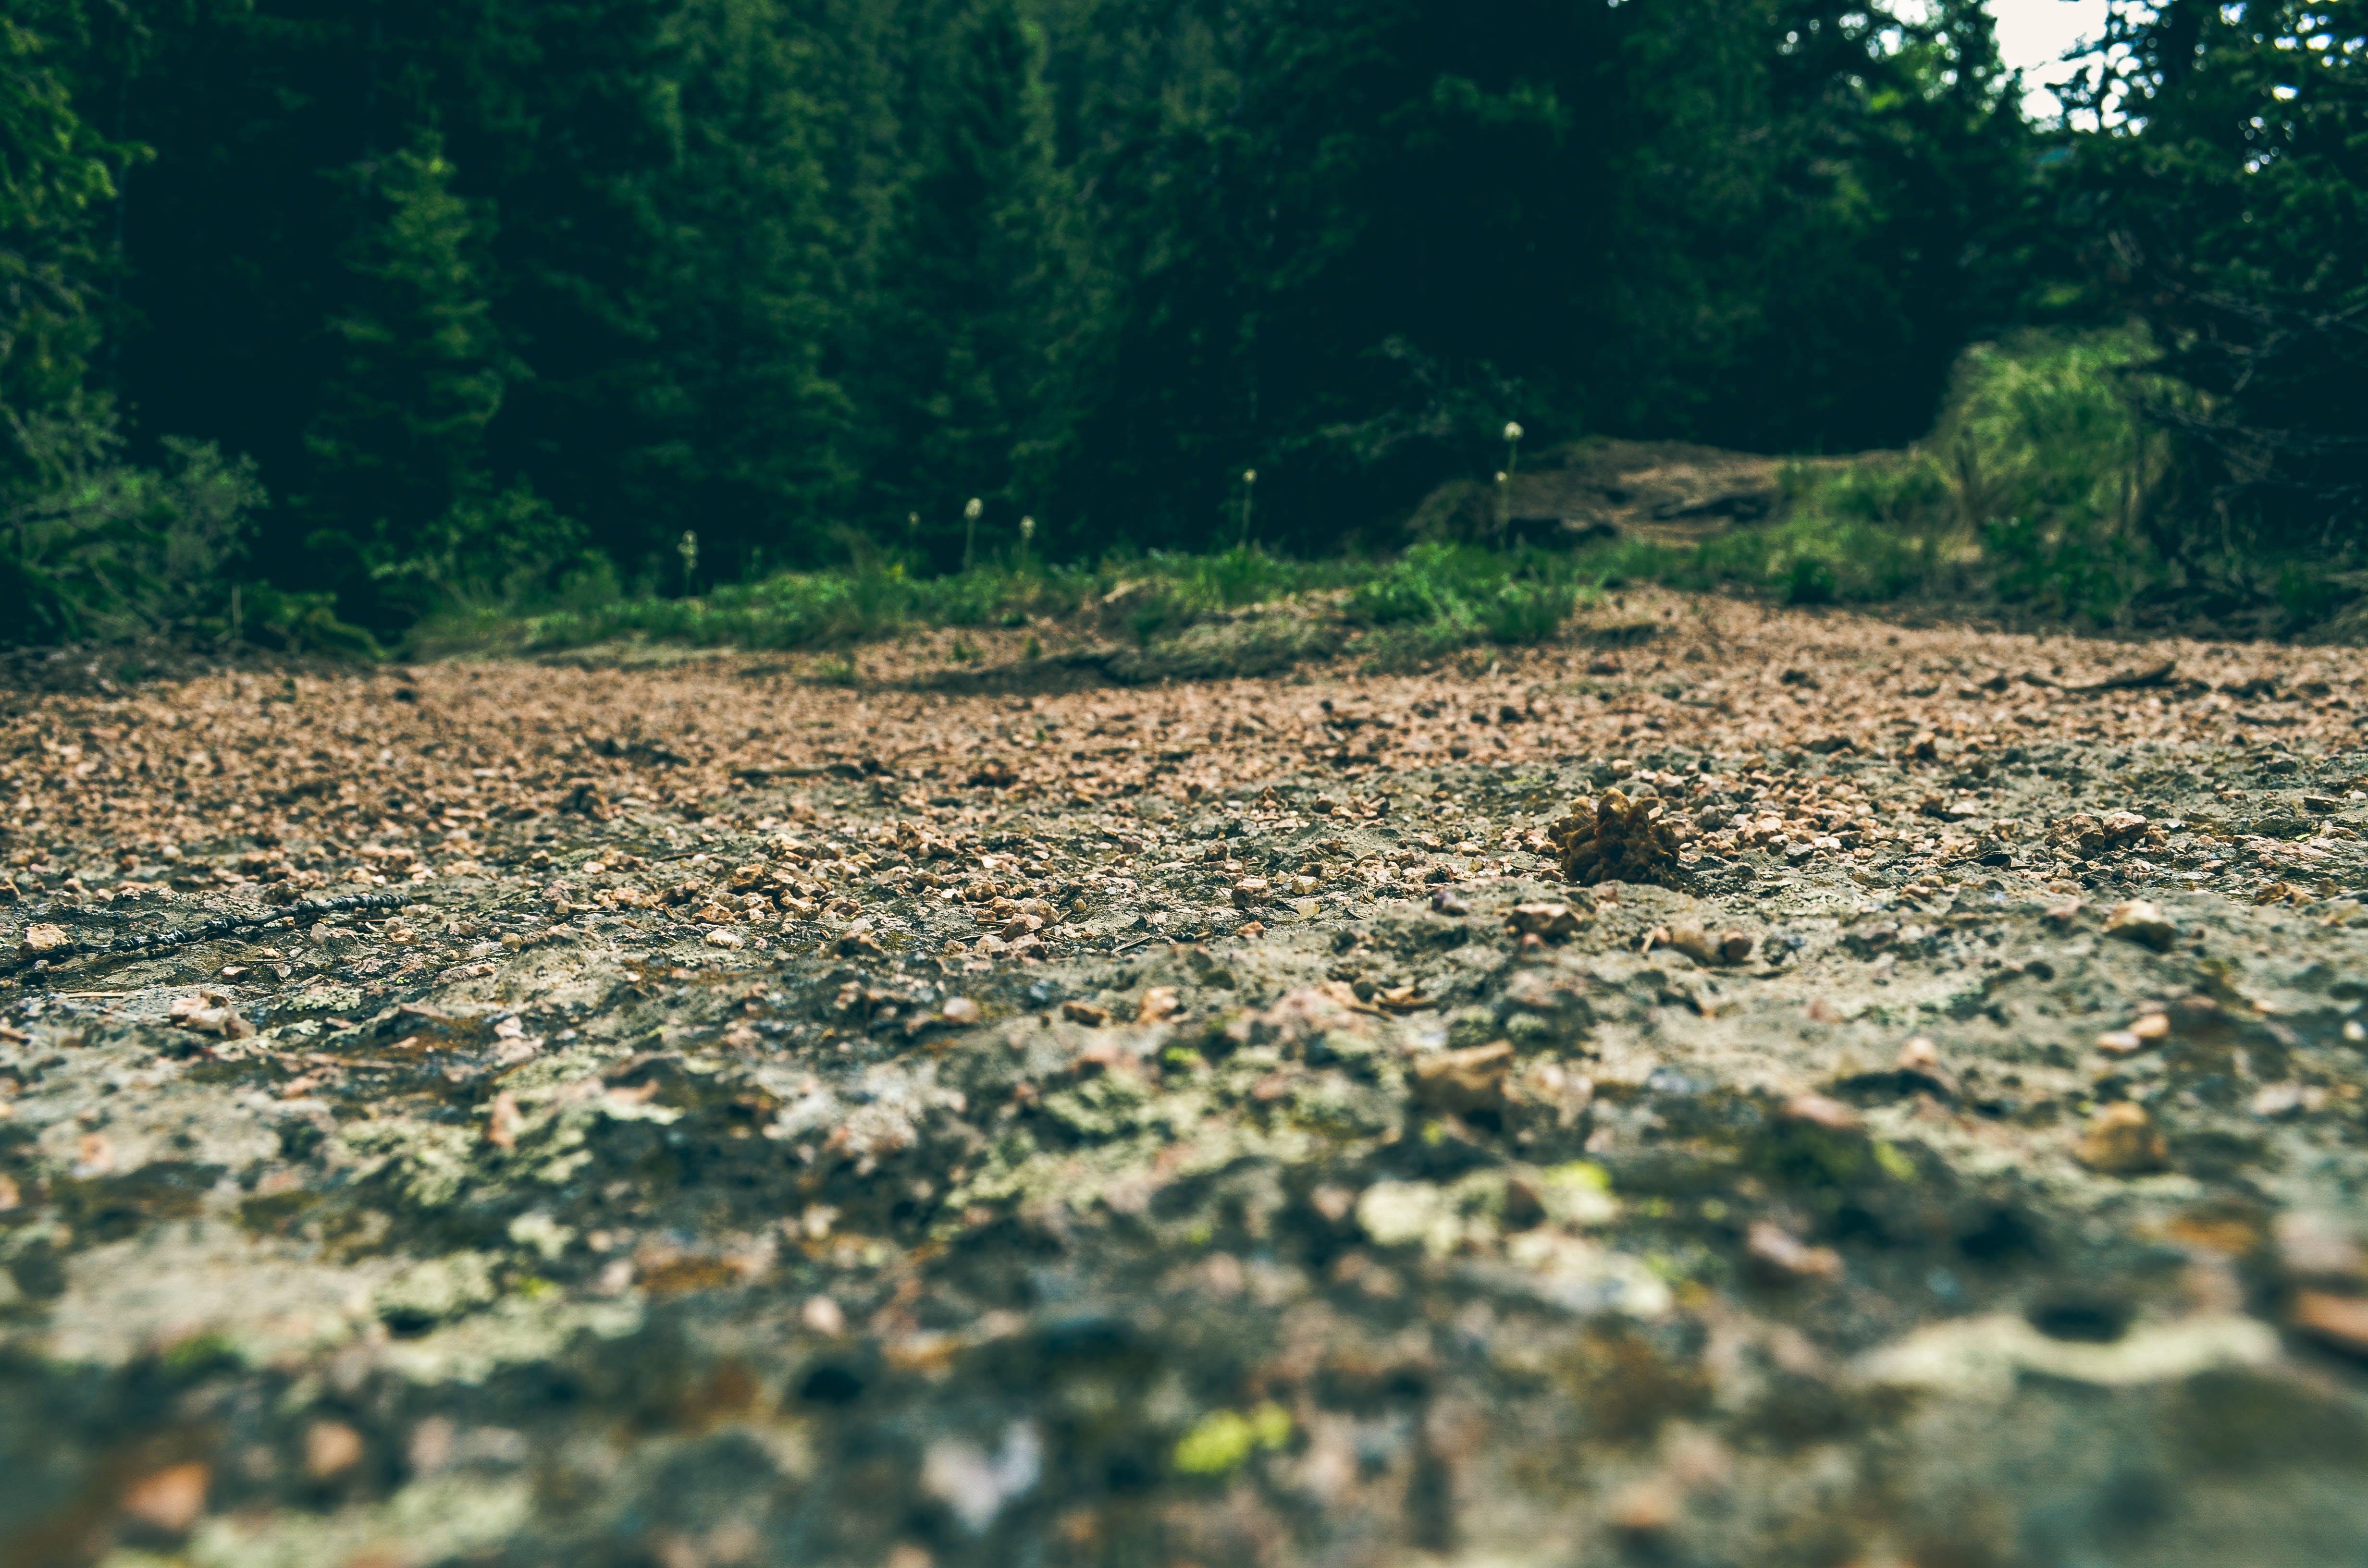 Brown Soil Near Green Trees